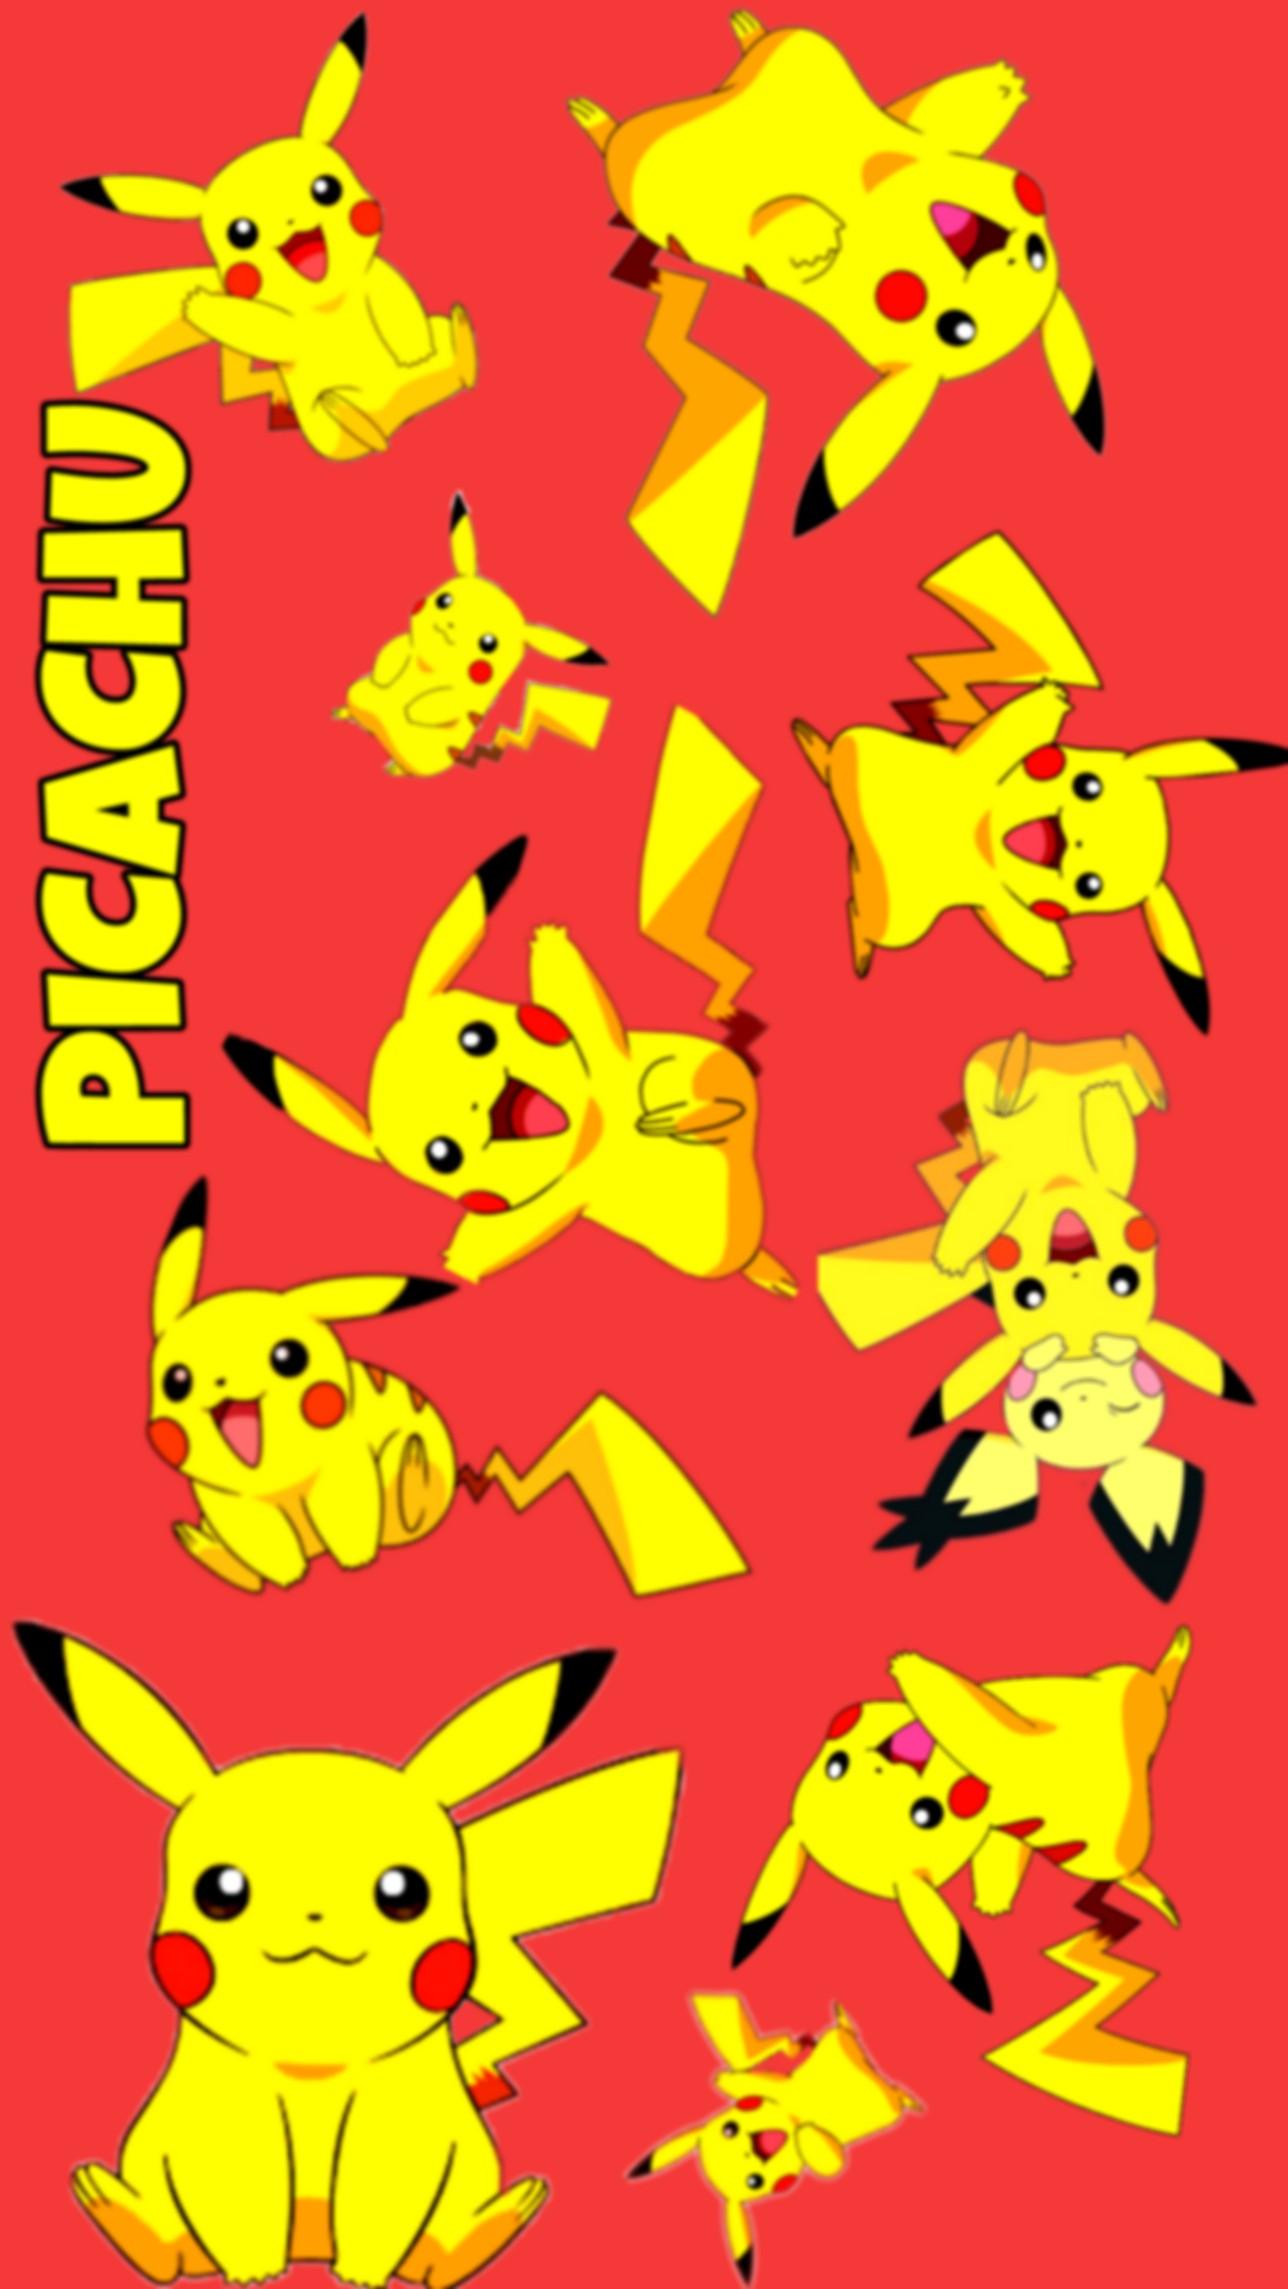 Picachu Pokemon Pocketmonster ピカチュウ ポケモン ポケットモンスター 壁紙